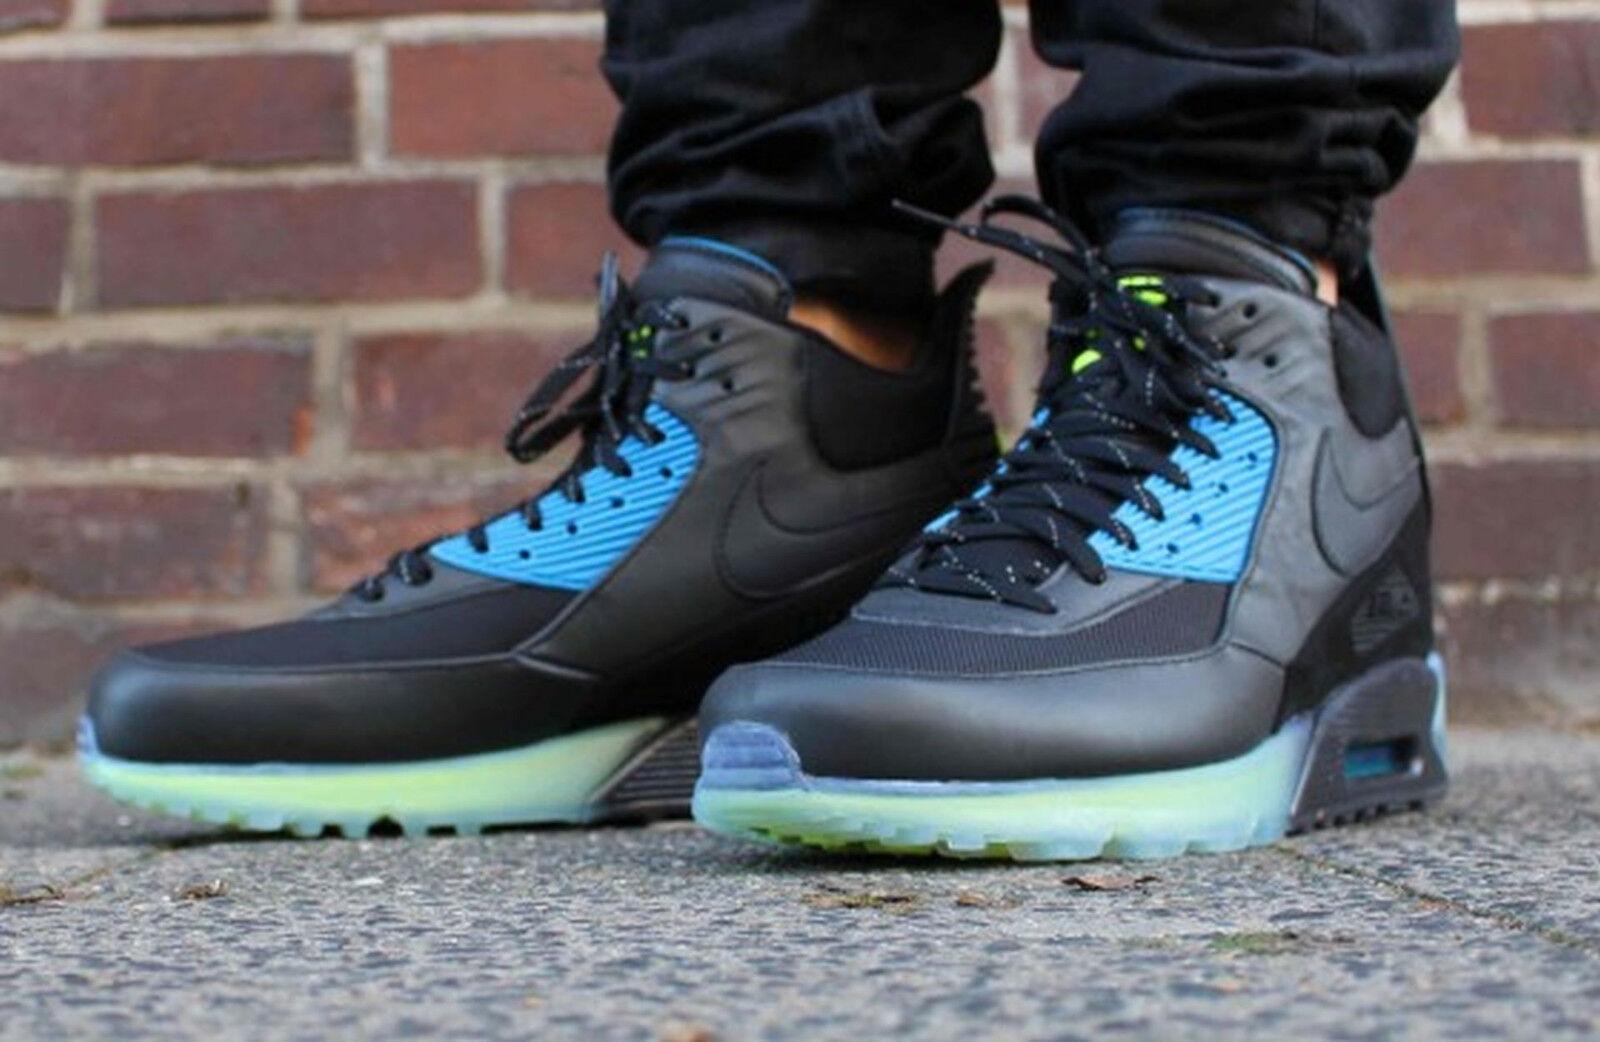 nike air max 90 sneakerboot eis 684722-001 sz 9 - schwarze asche blaue neon - 9 foto 7b9bcb